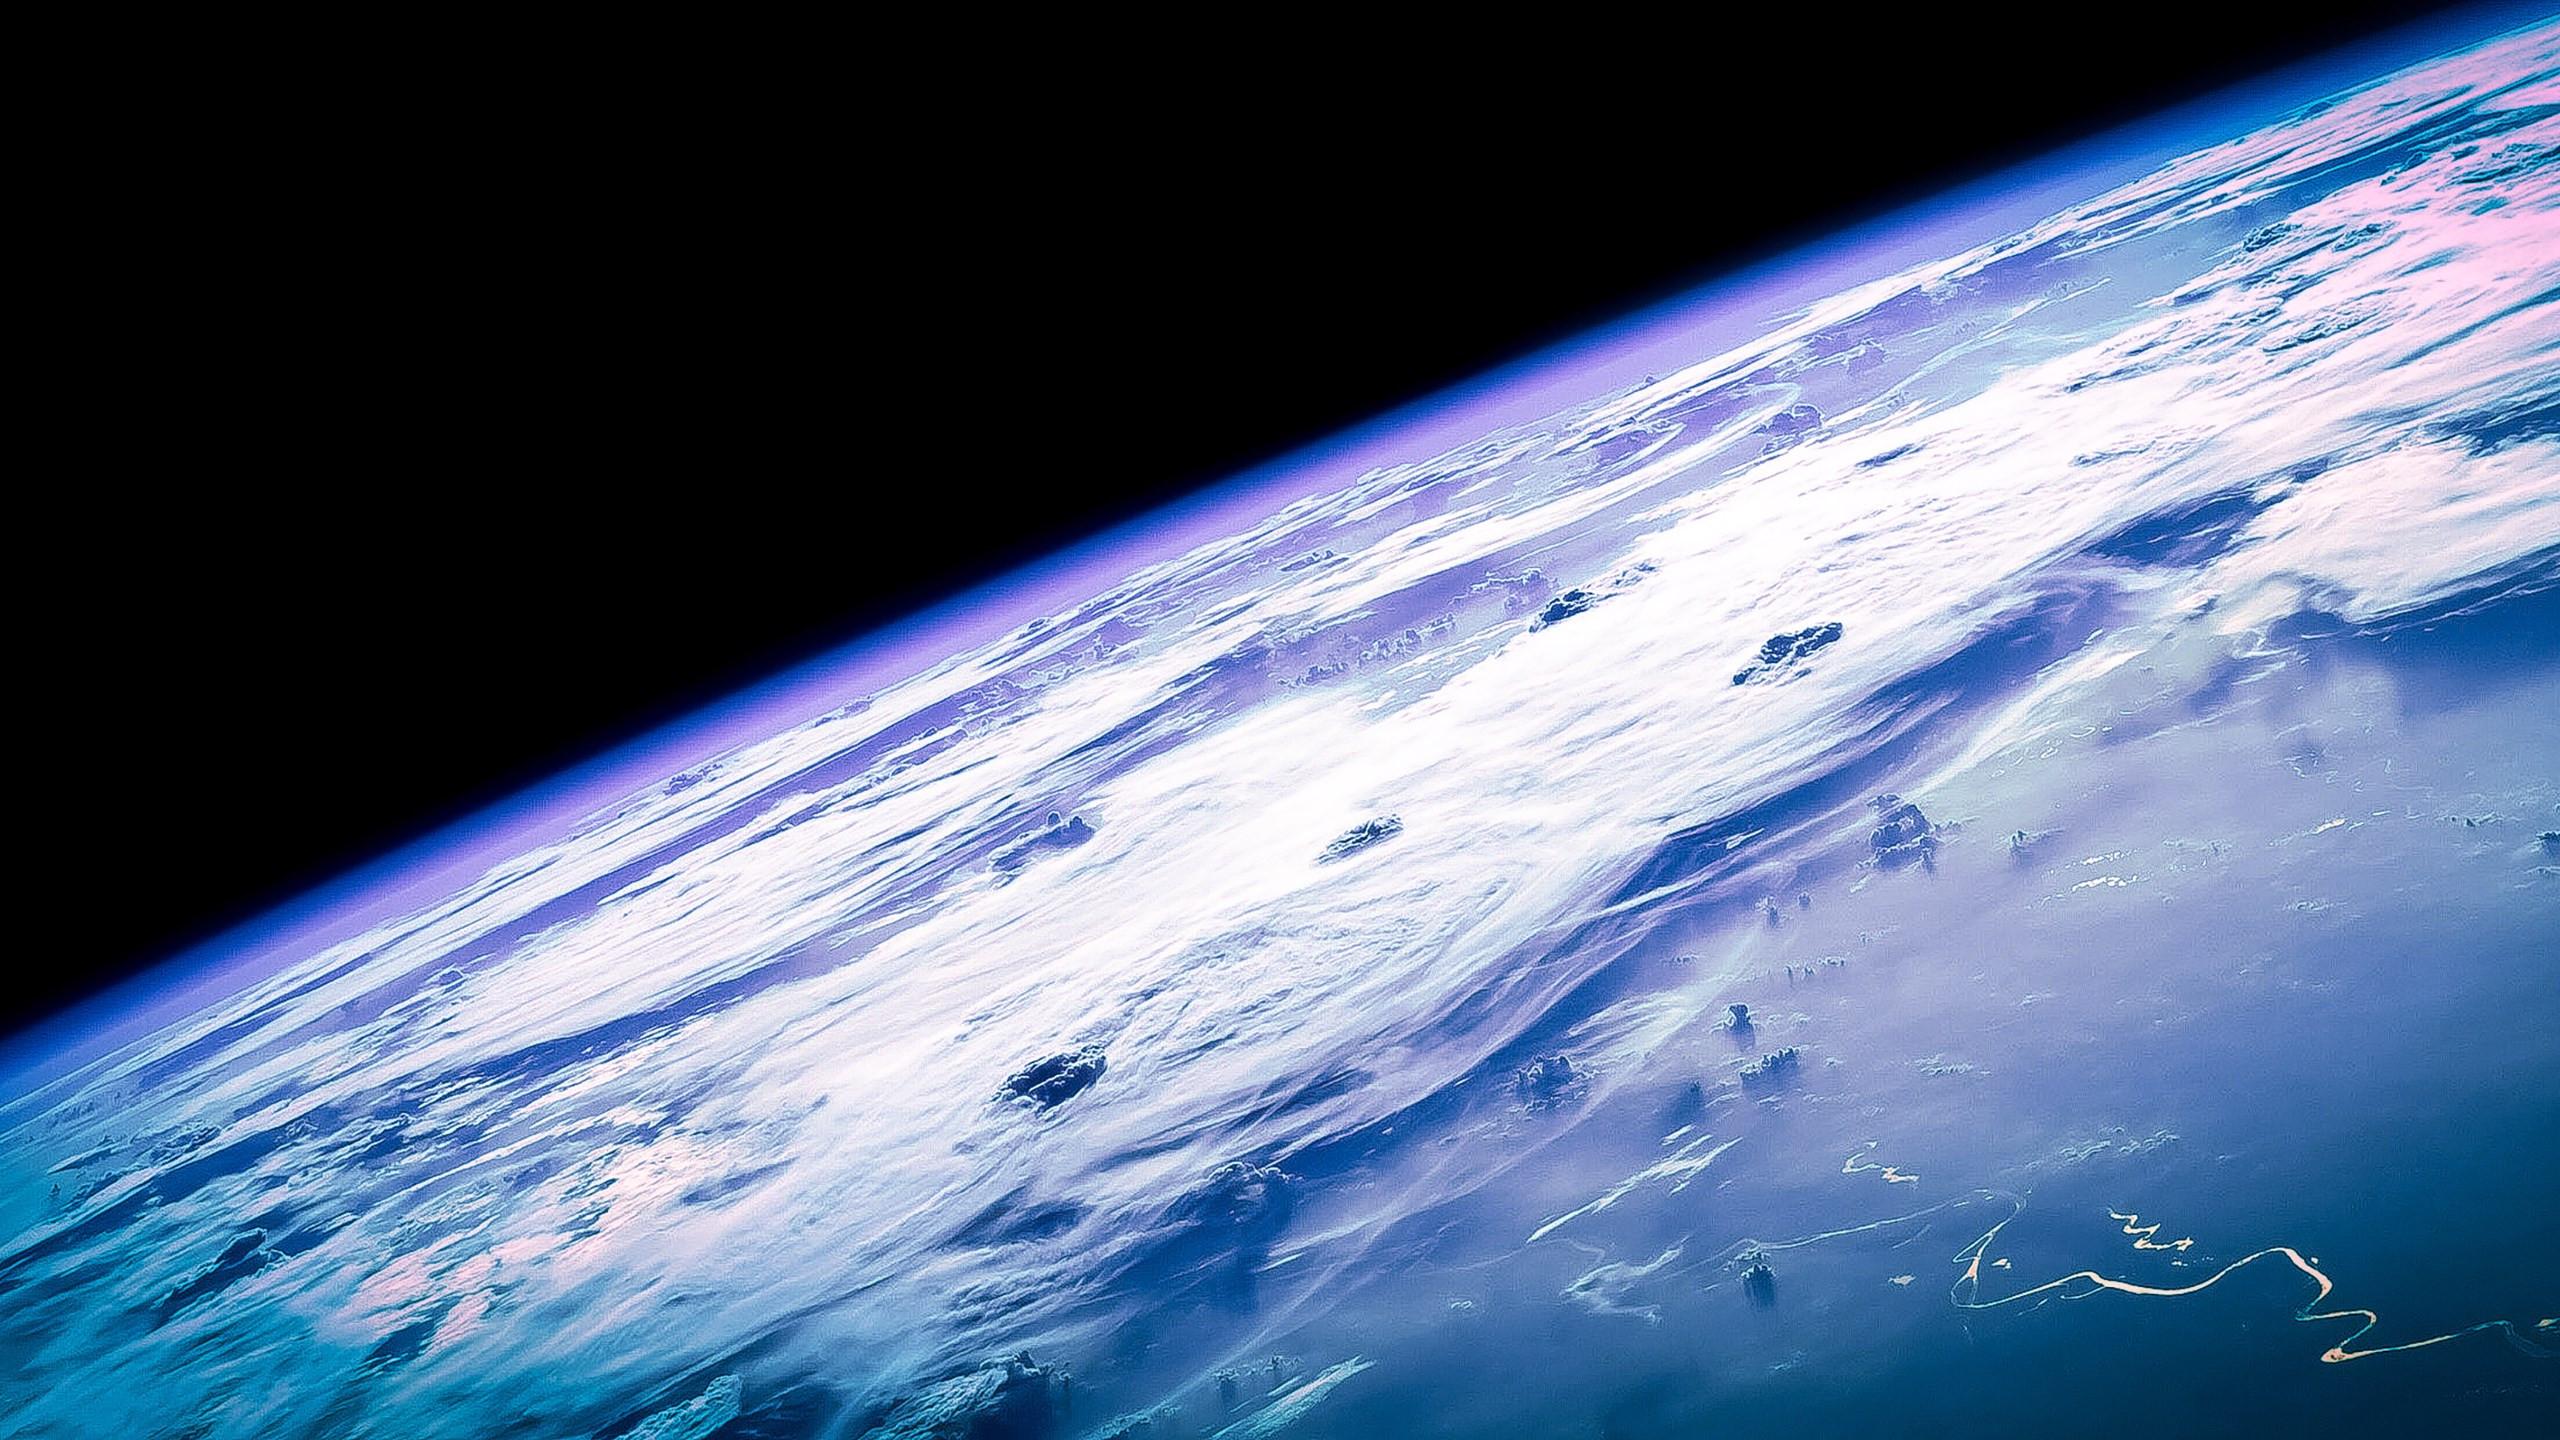 Download Wallpaper Macos X Earth Horizon 2560x1440